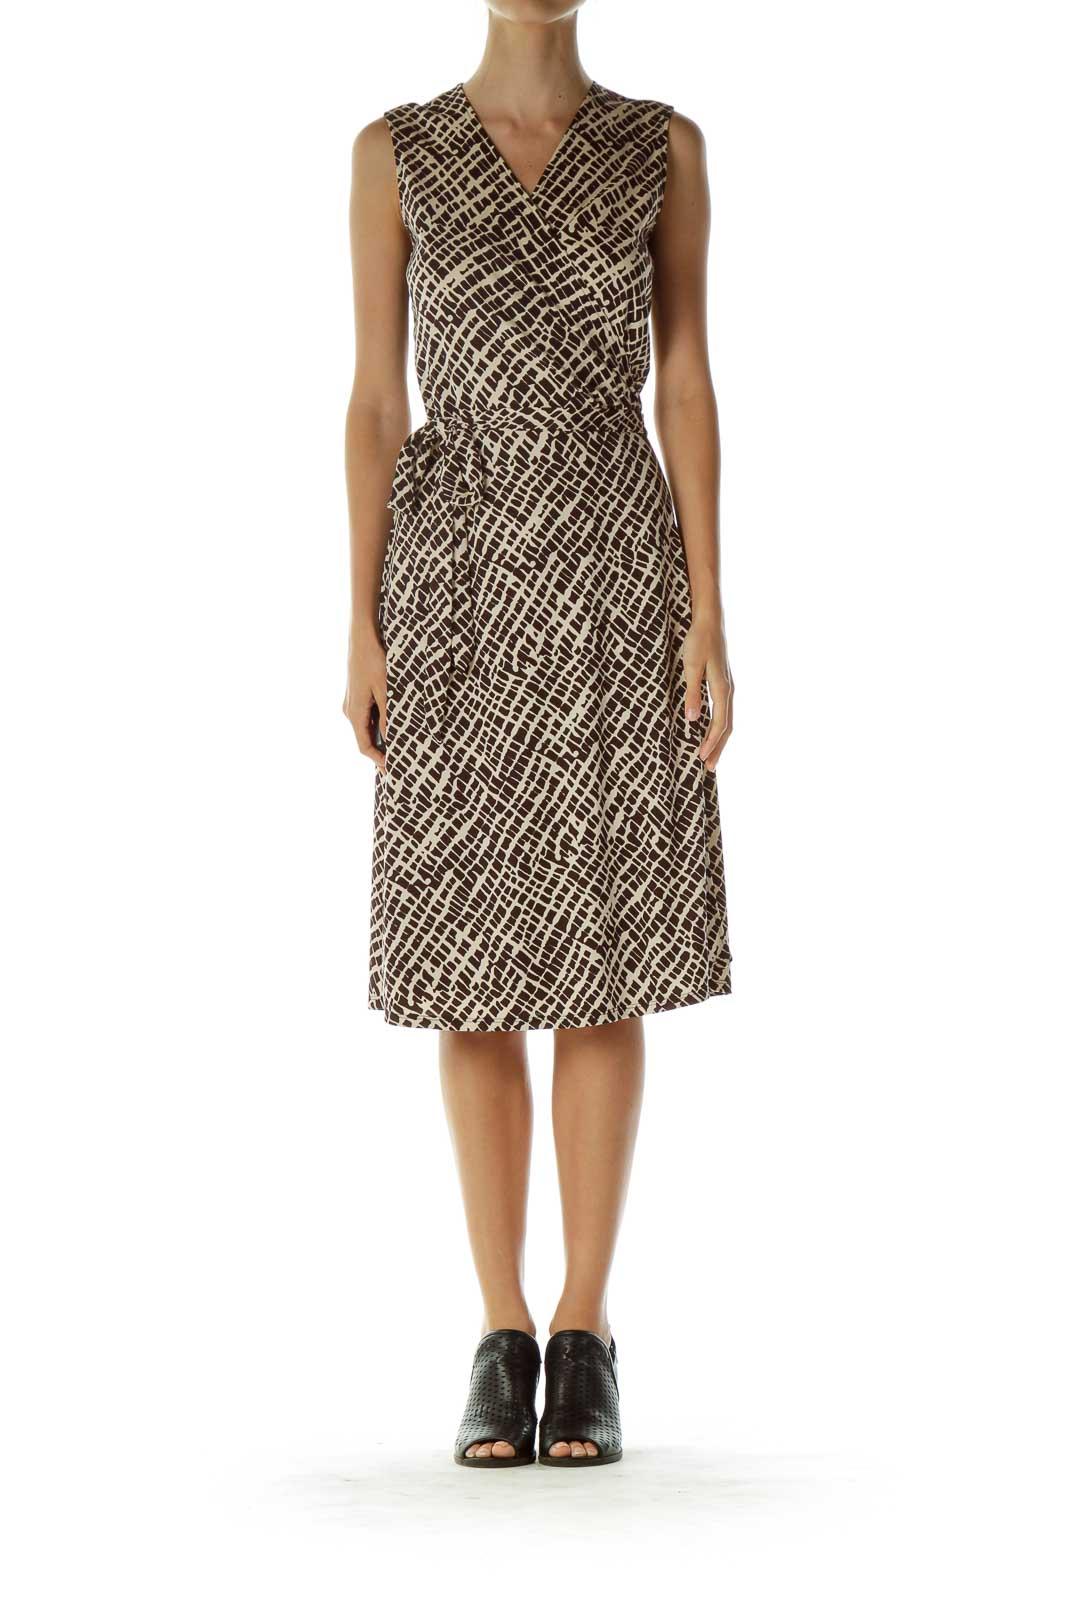 Brown and Beige Printed Wrap Dress